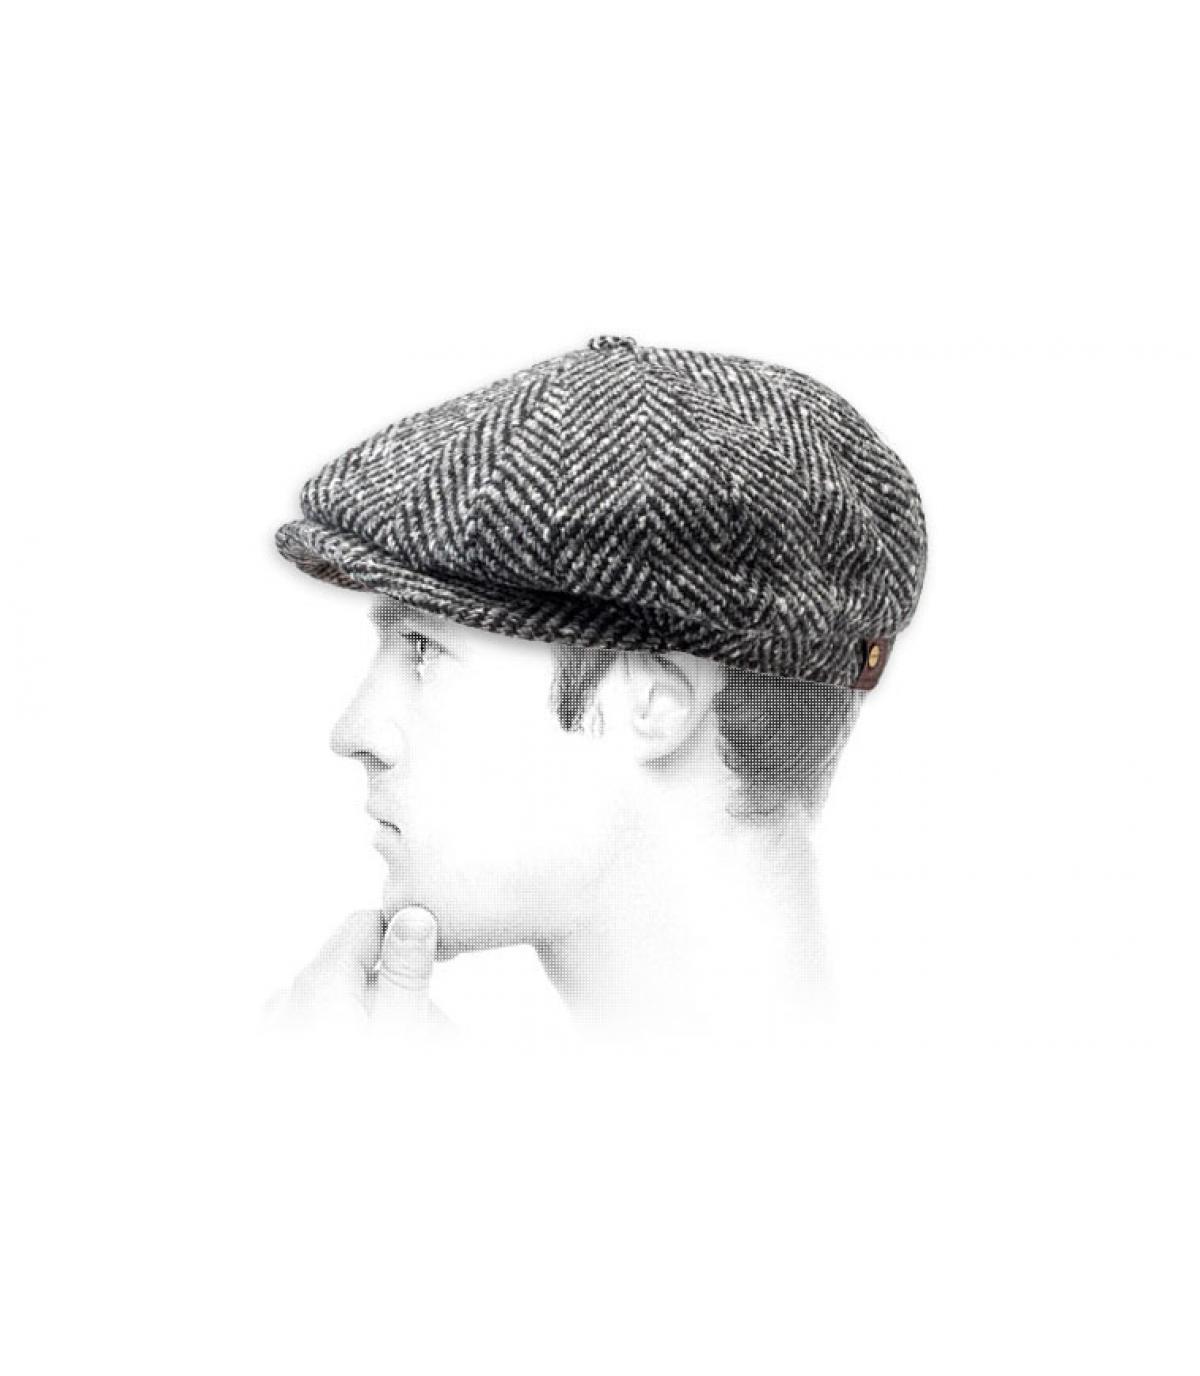 Détails Hatteras Herringbone black white - image 3